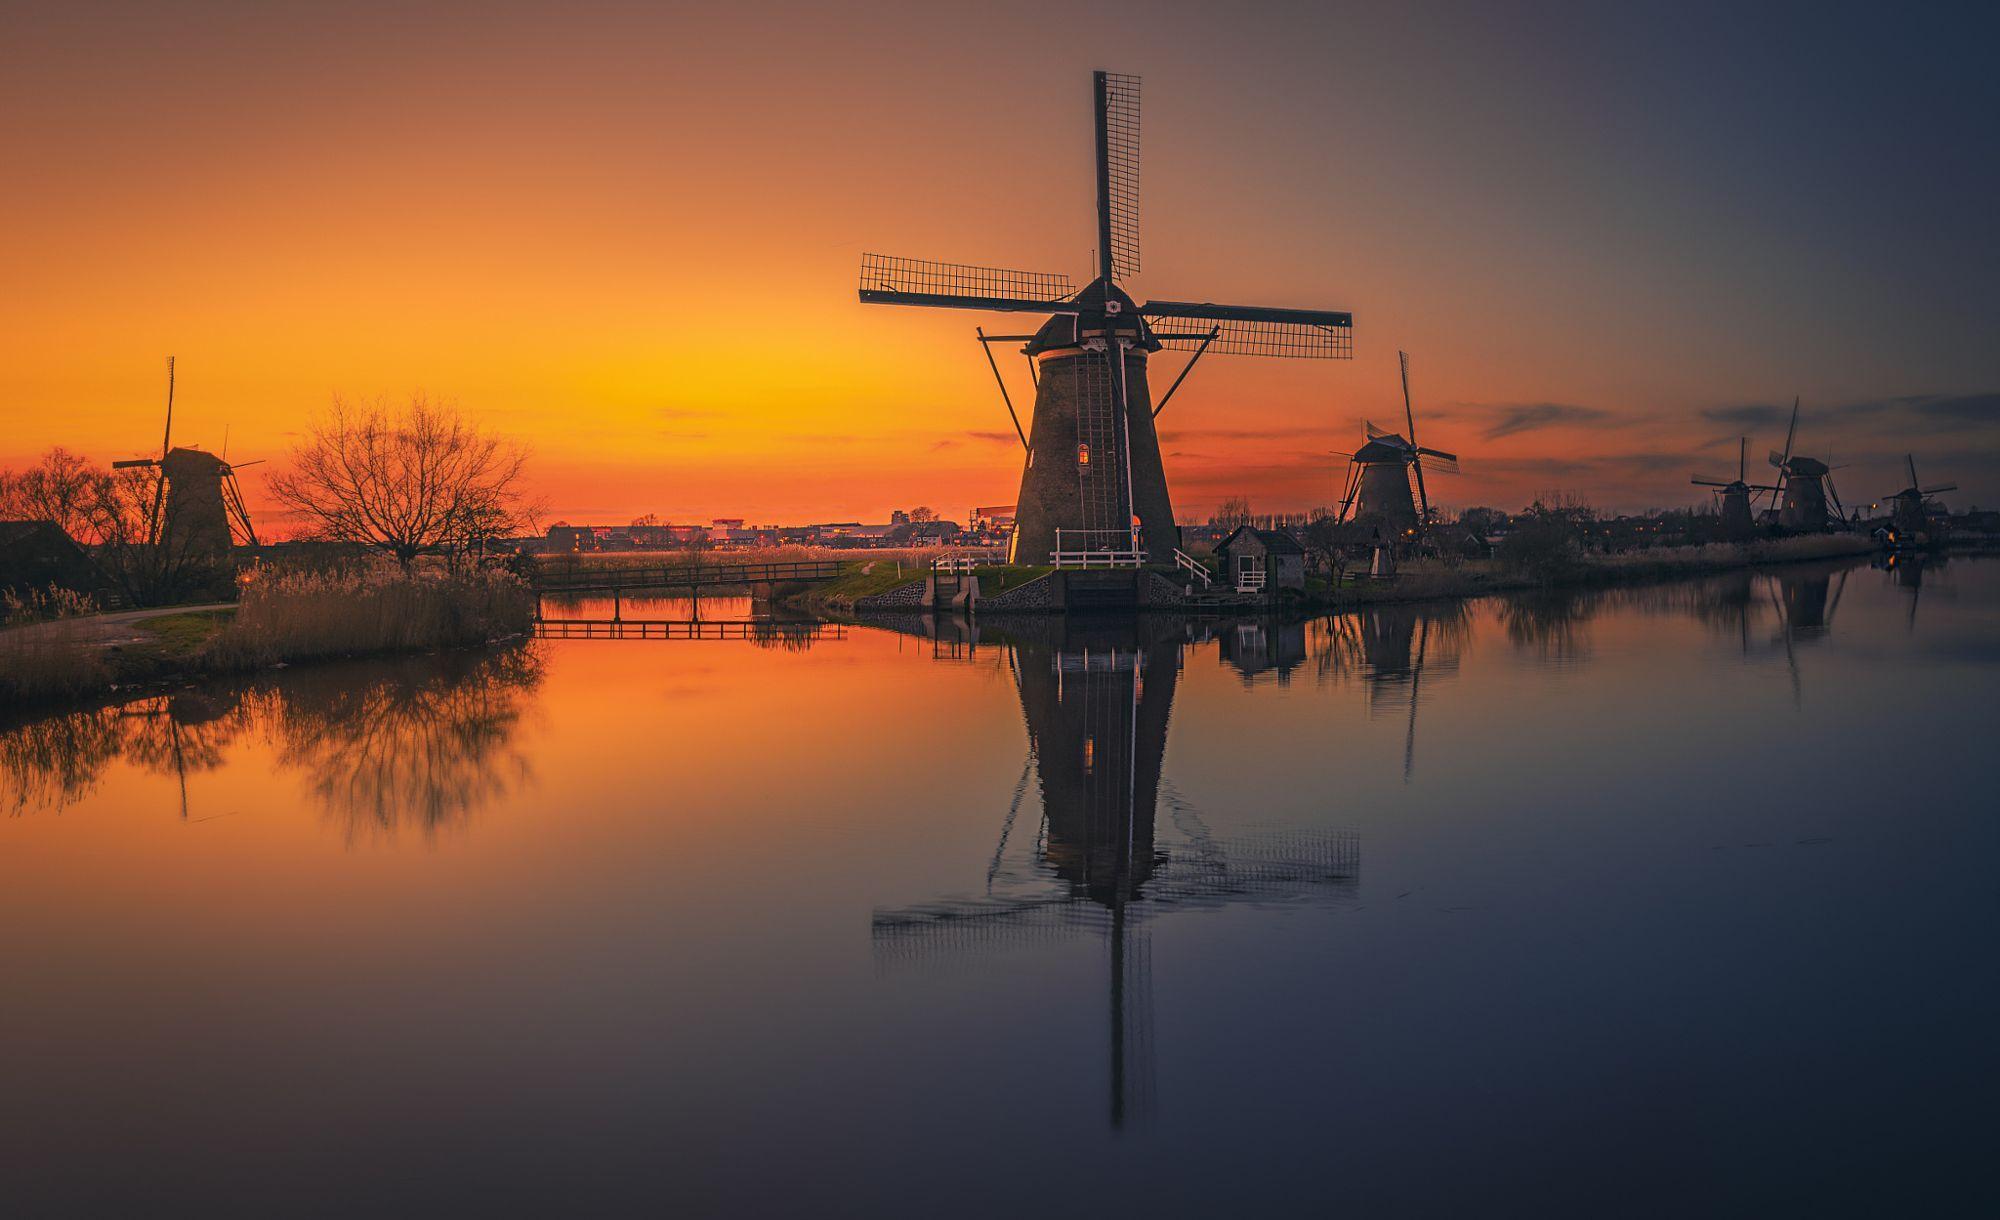 Kinderdijk Holland.  City and architecture photo by remoscarfo http://rarme.com/?F9gZi